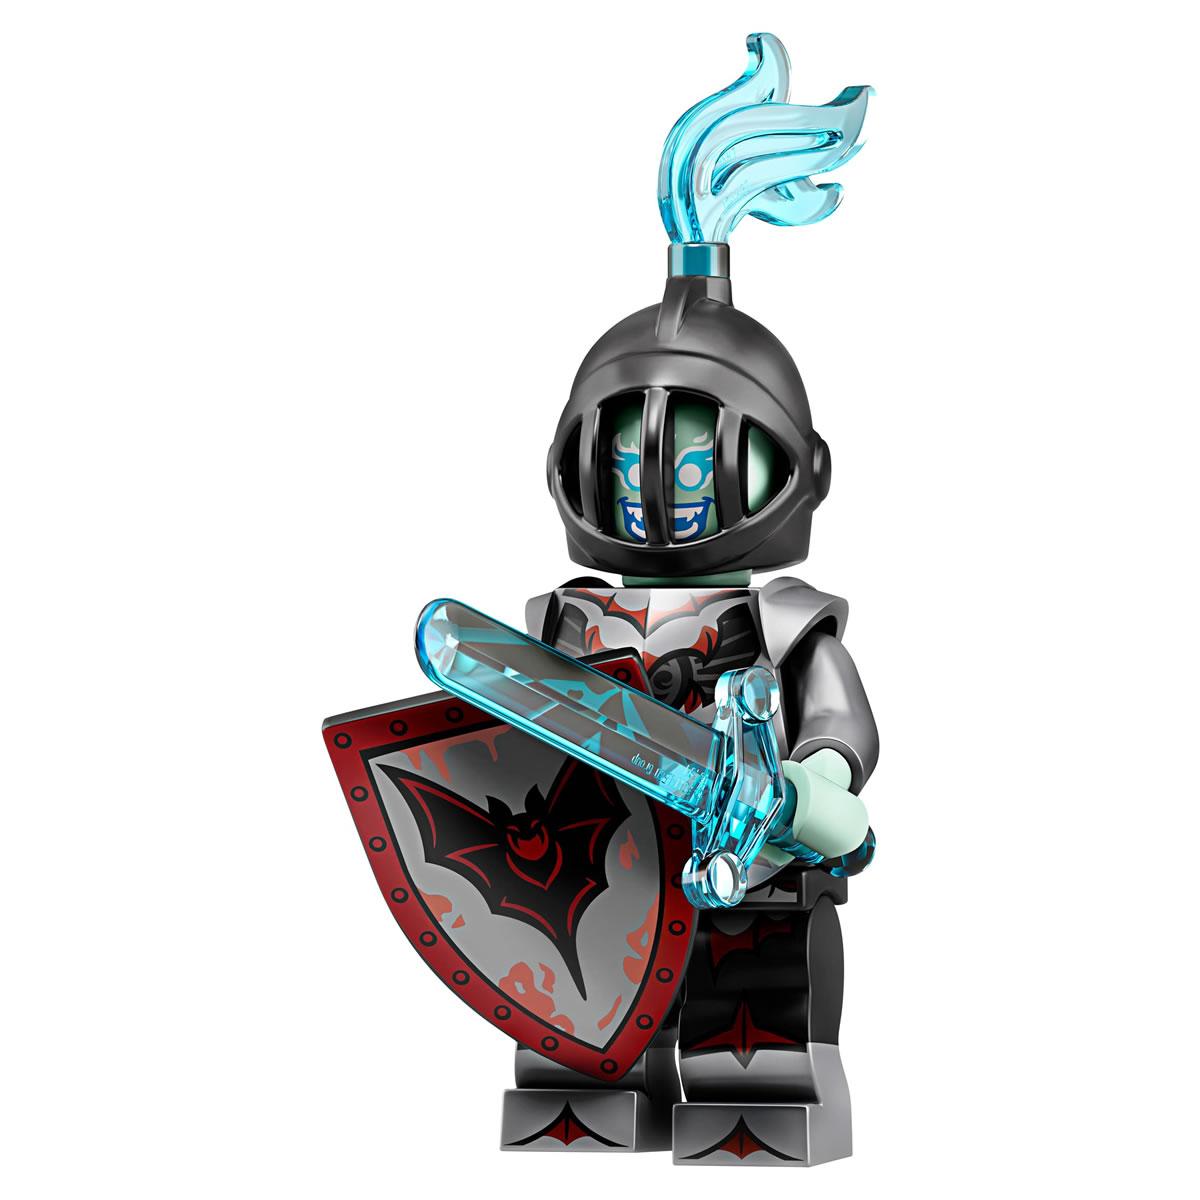 lego-minifiguren-sammelserie-collectible-minifigures-serie-19-71025-2019-7 zusammengebaut.com